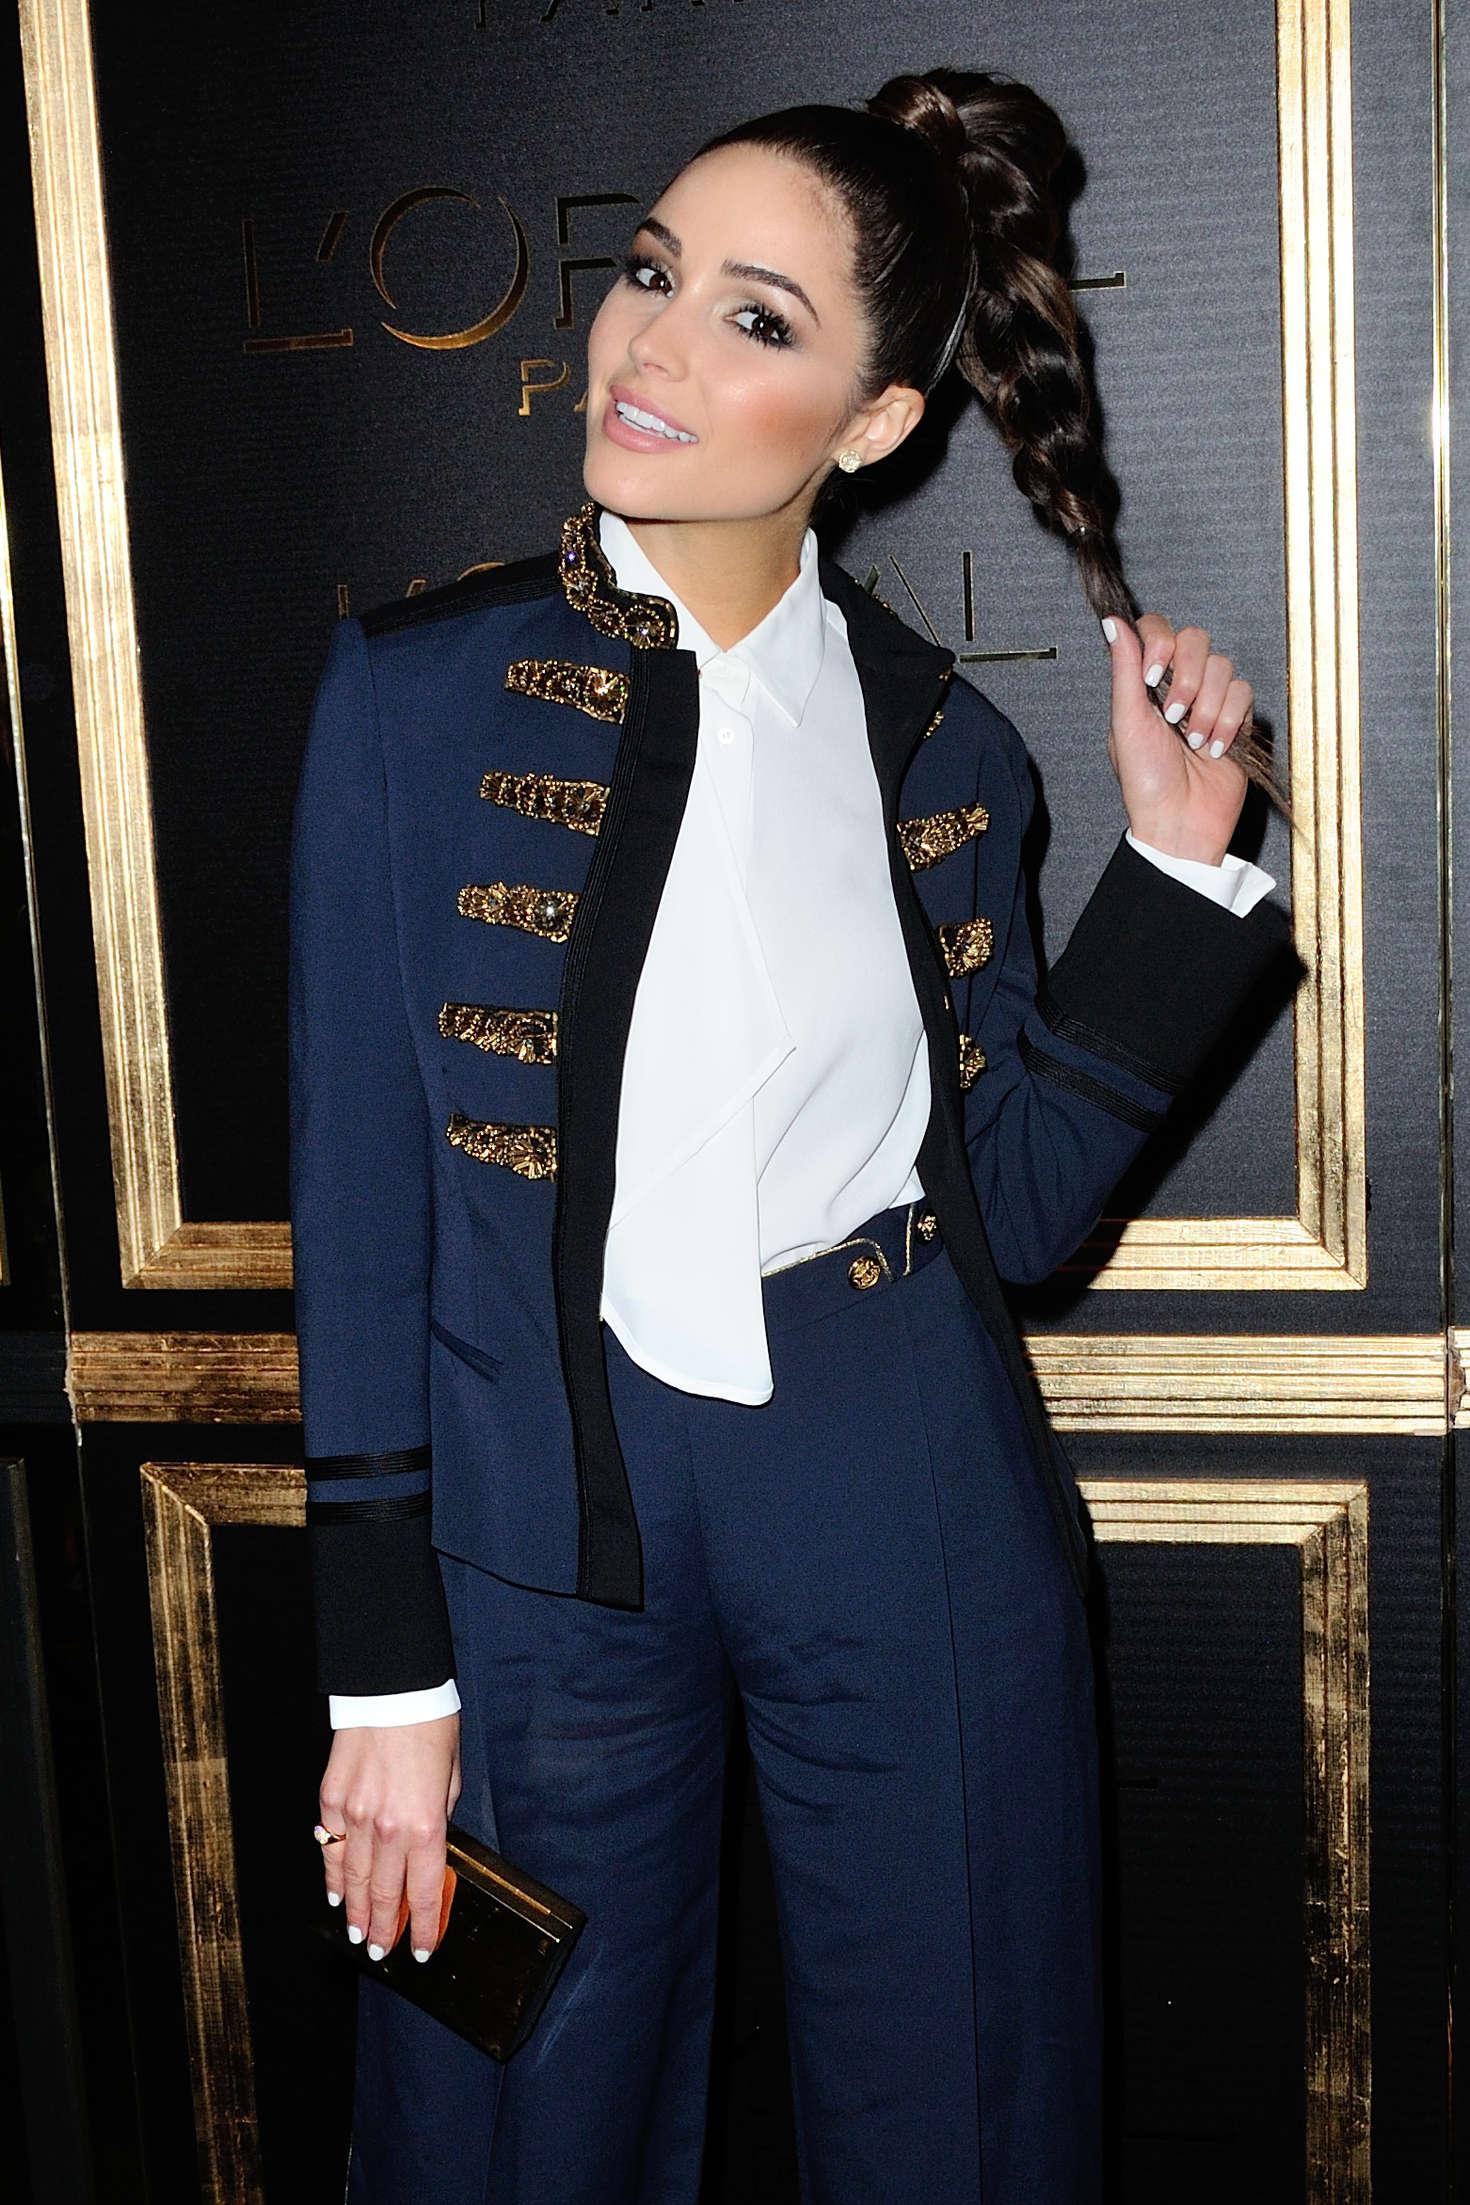 Olivia Culpo - L'Oreal Gold Obsession Party 2016 in Paris